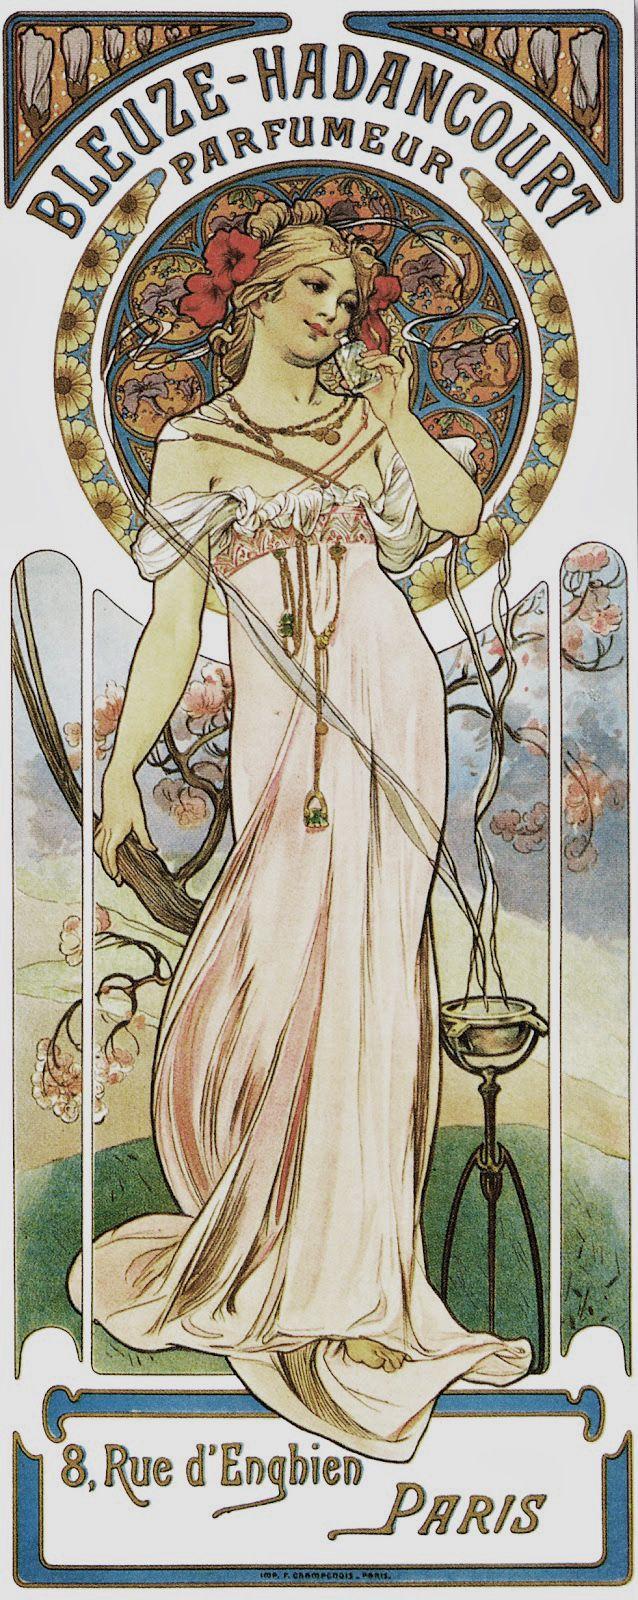 1900c+Poster+for+Bleuze-Hadancourt+Parfumeur+72+x+34.3+cm.jpg (638×1600)